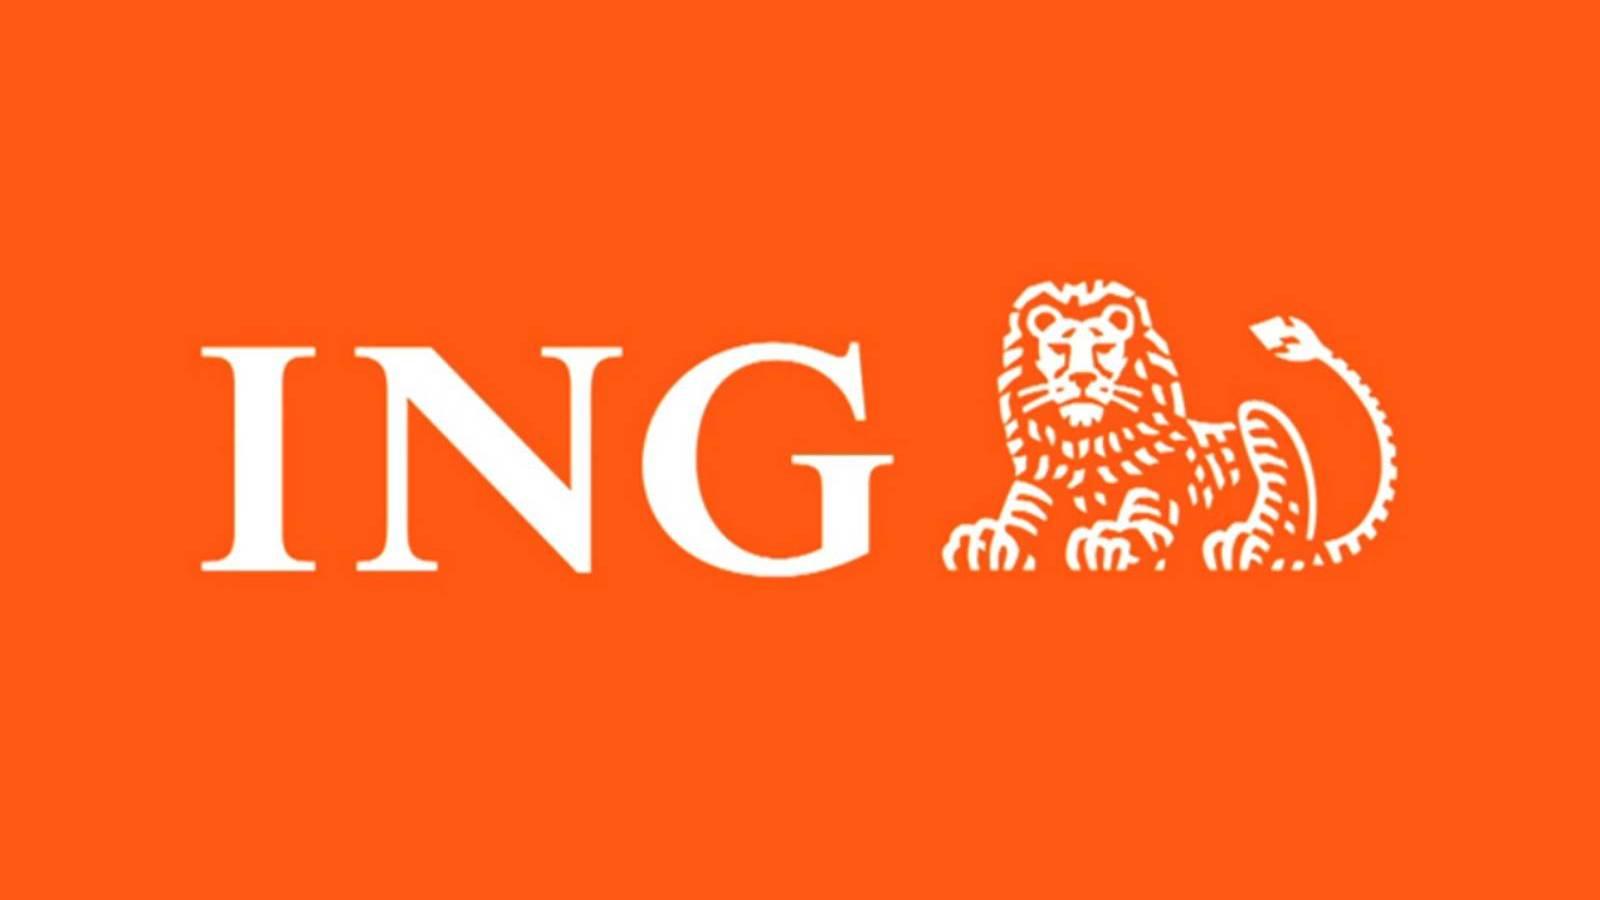 ING Bank inchidere